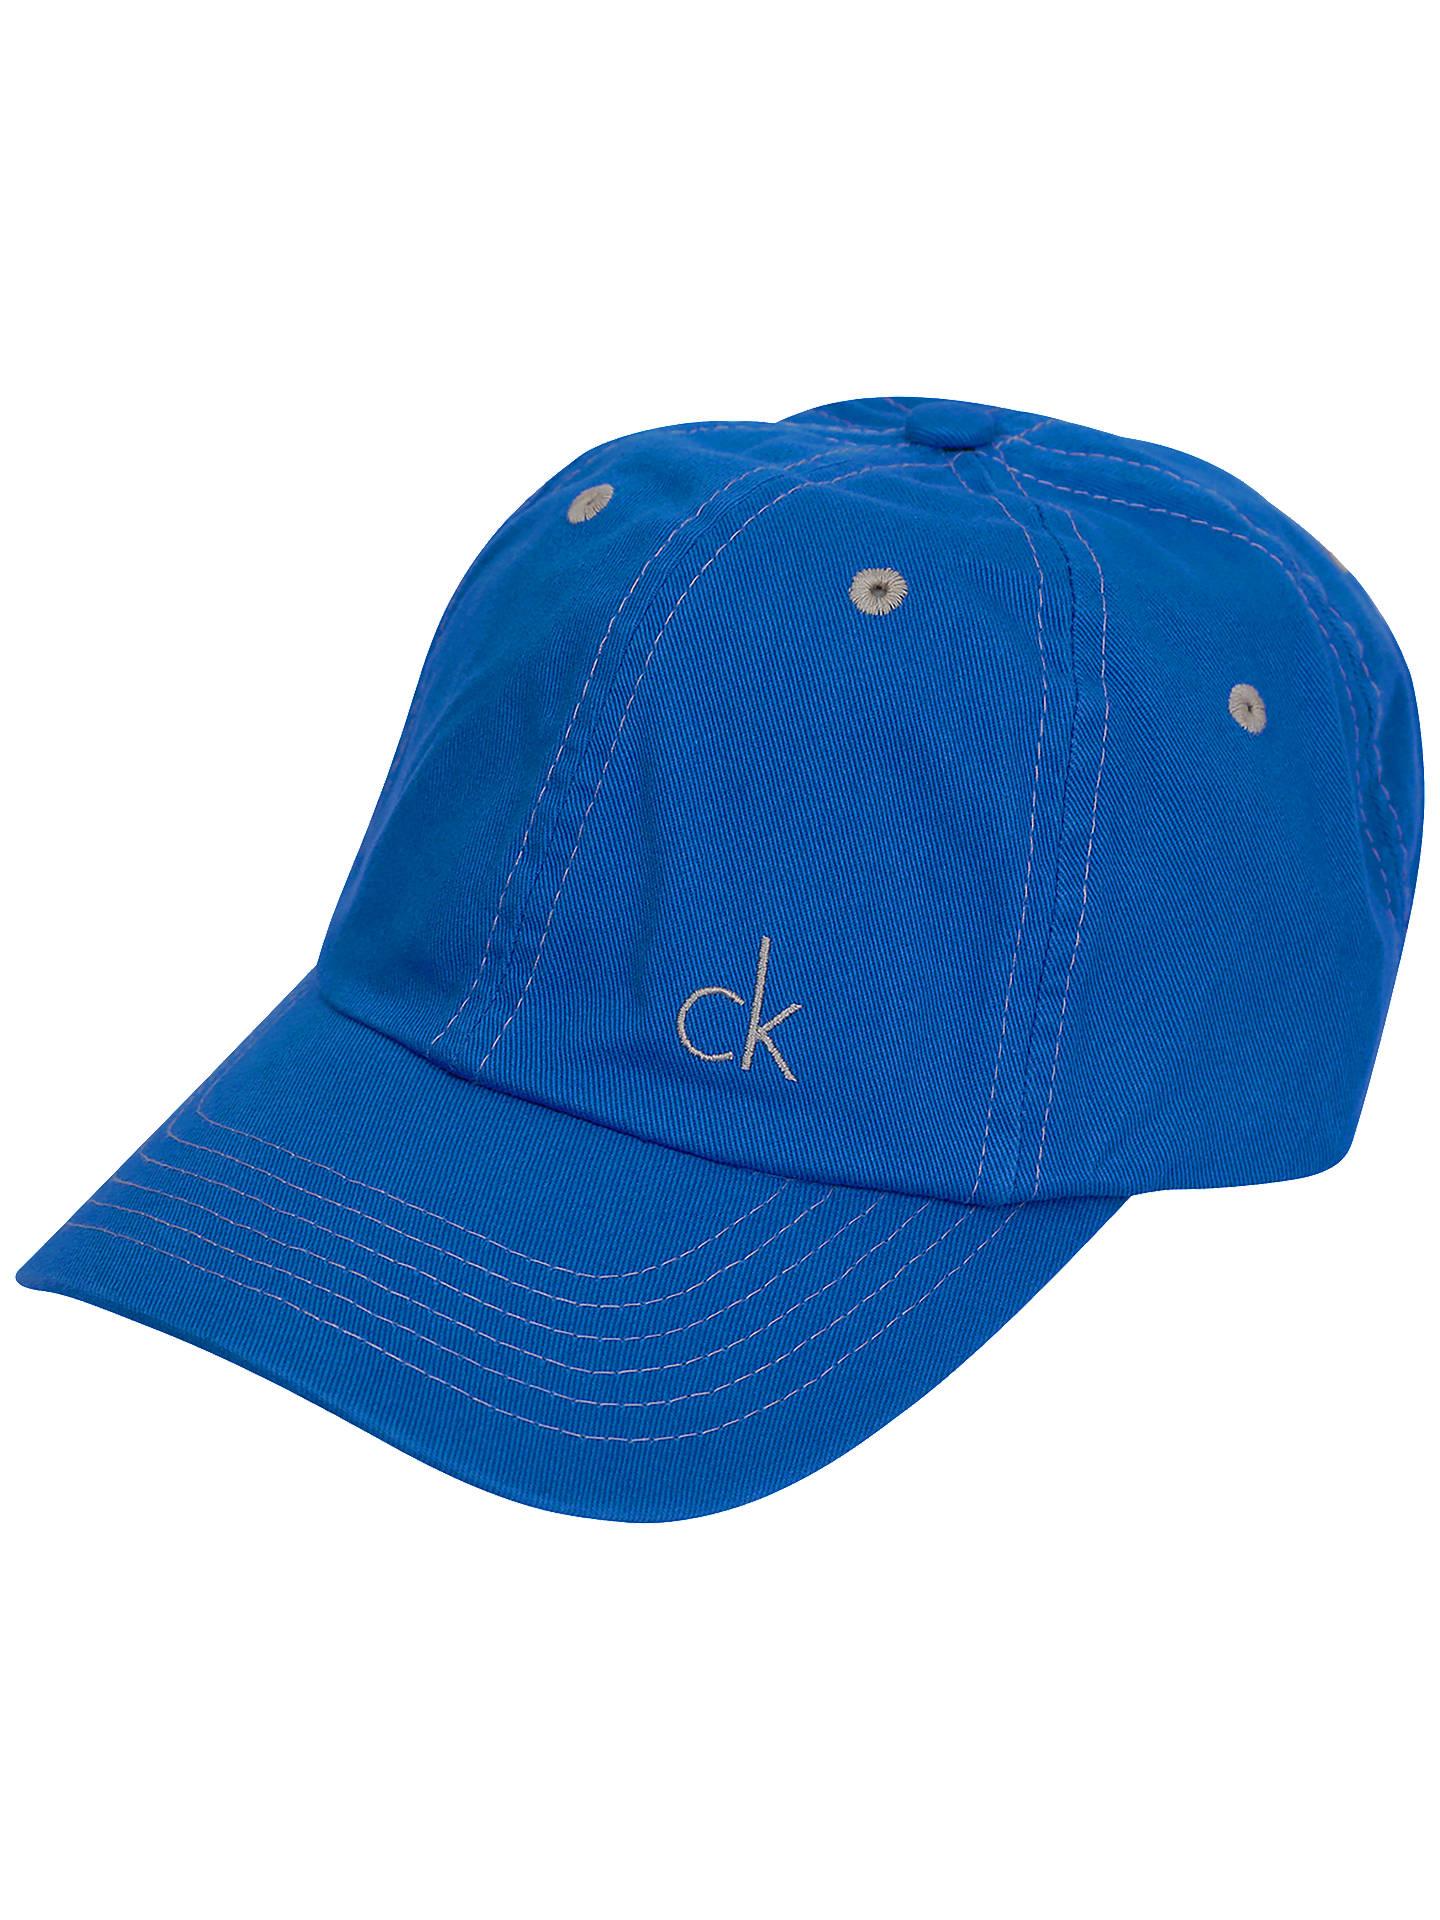 Calvin Klein Golf Baseball Cap at John Lewis   Partners 133d6c231d5a